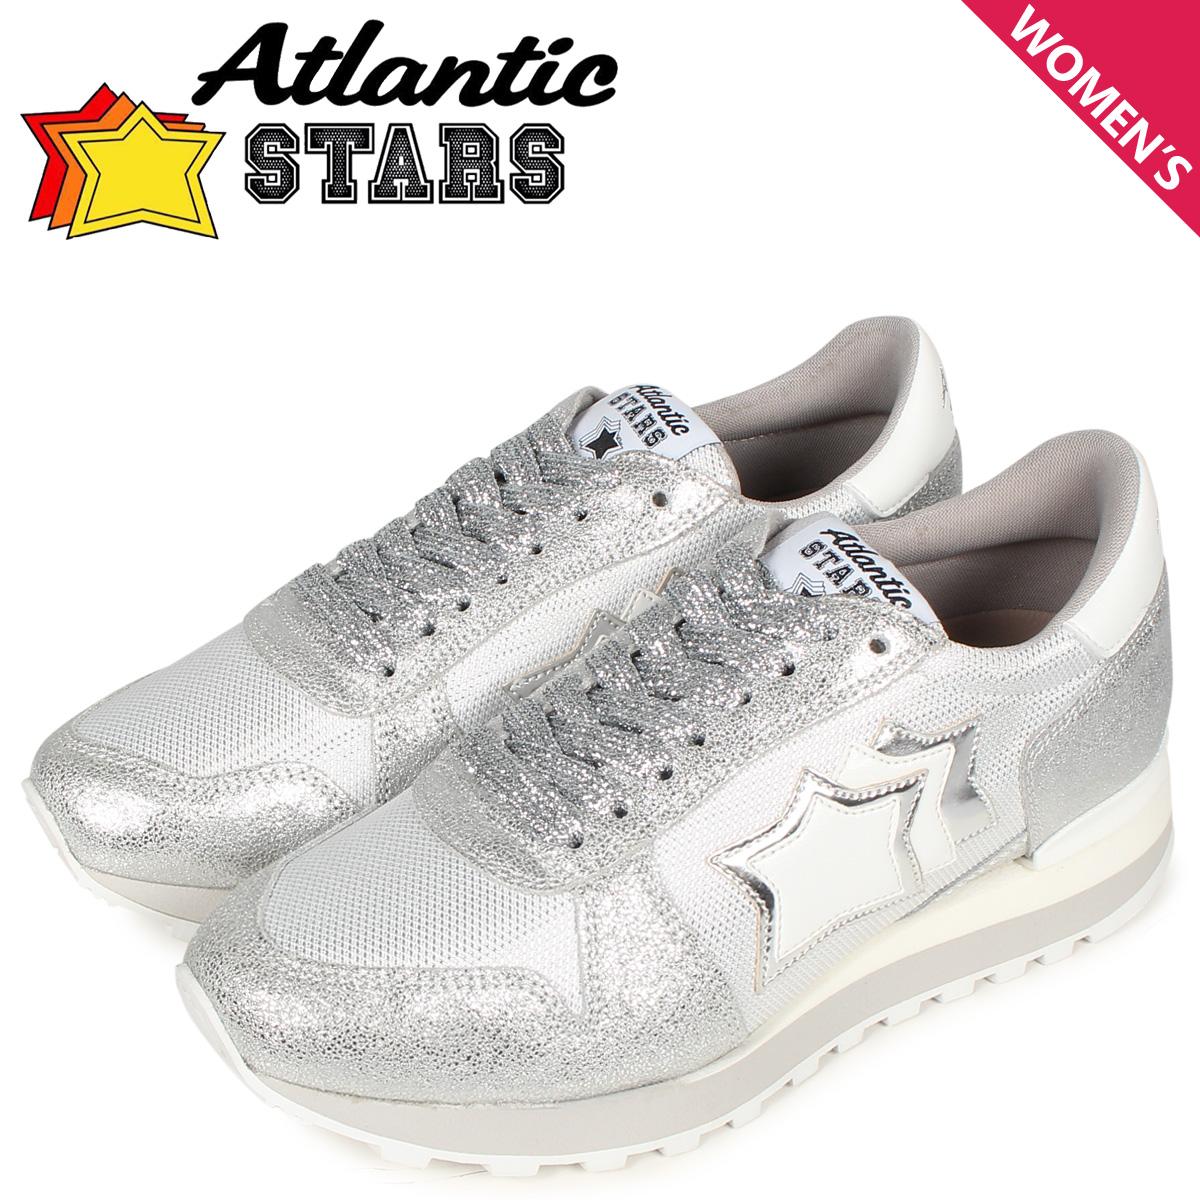 Atlantic STARS アトランティックスターズ アレナ スニーカー レディース ALHENA シルバー AG-NY-LGBB